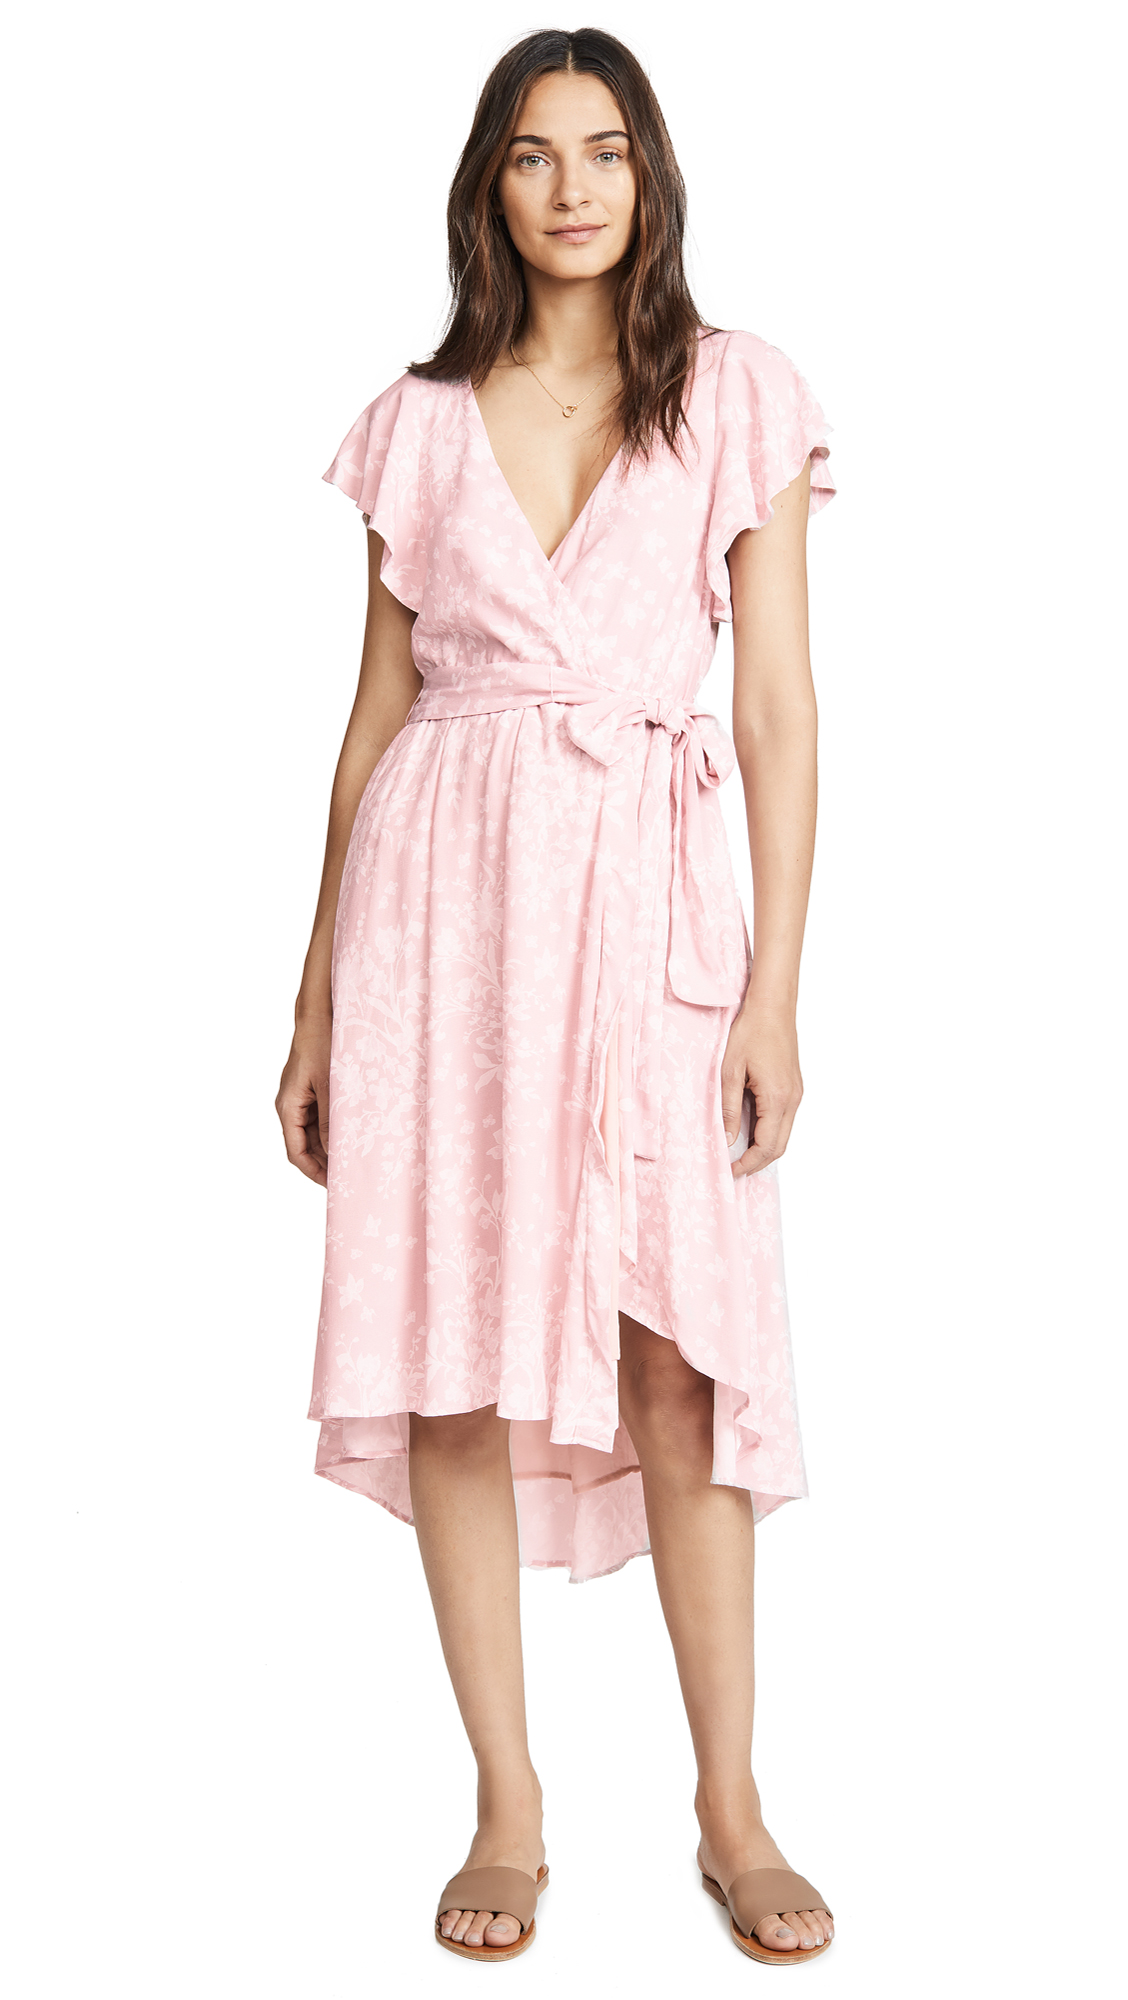 McGuire Denim Bassinger Wrap Dress In Million Dollar Doll